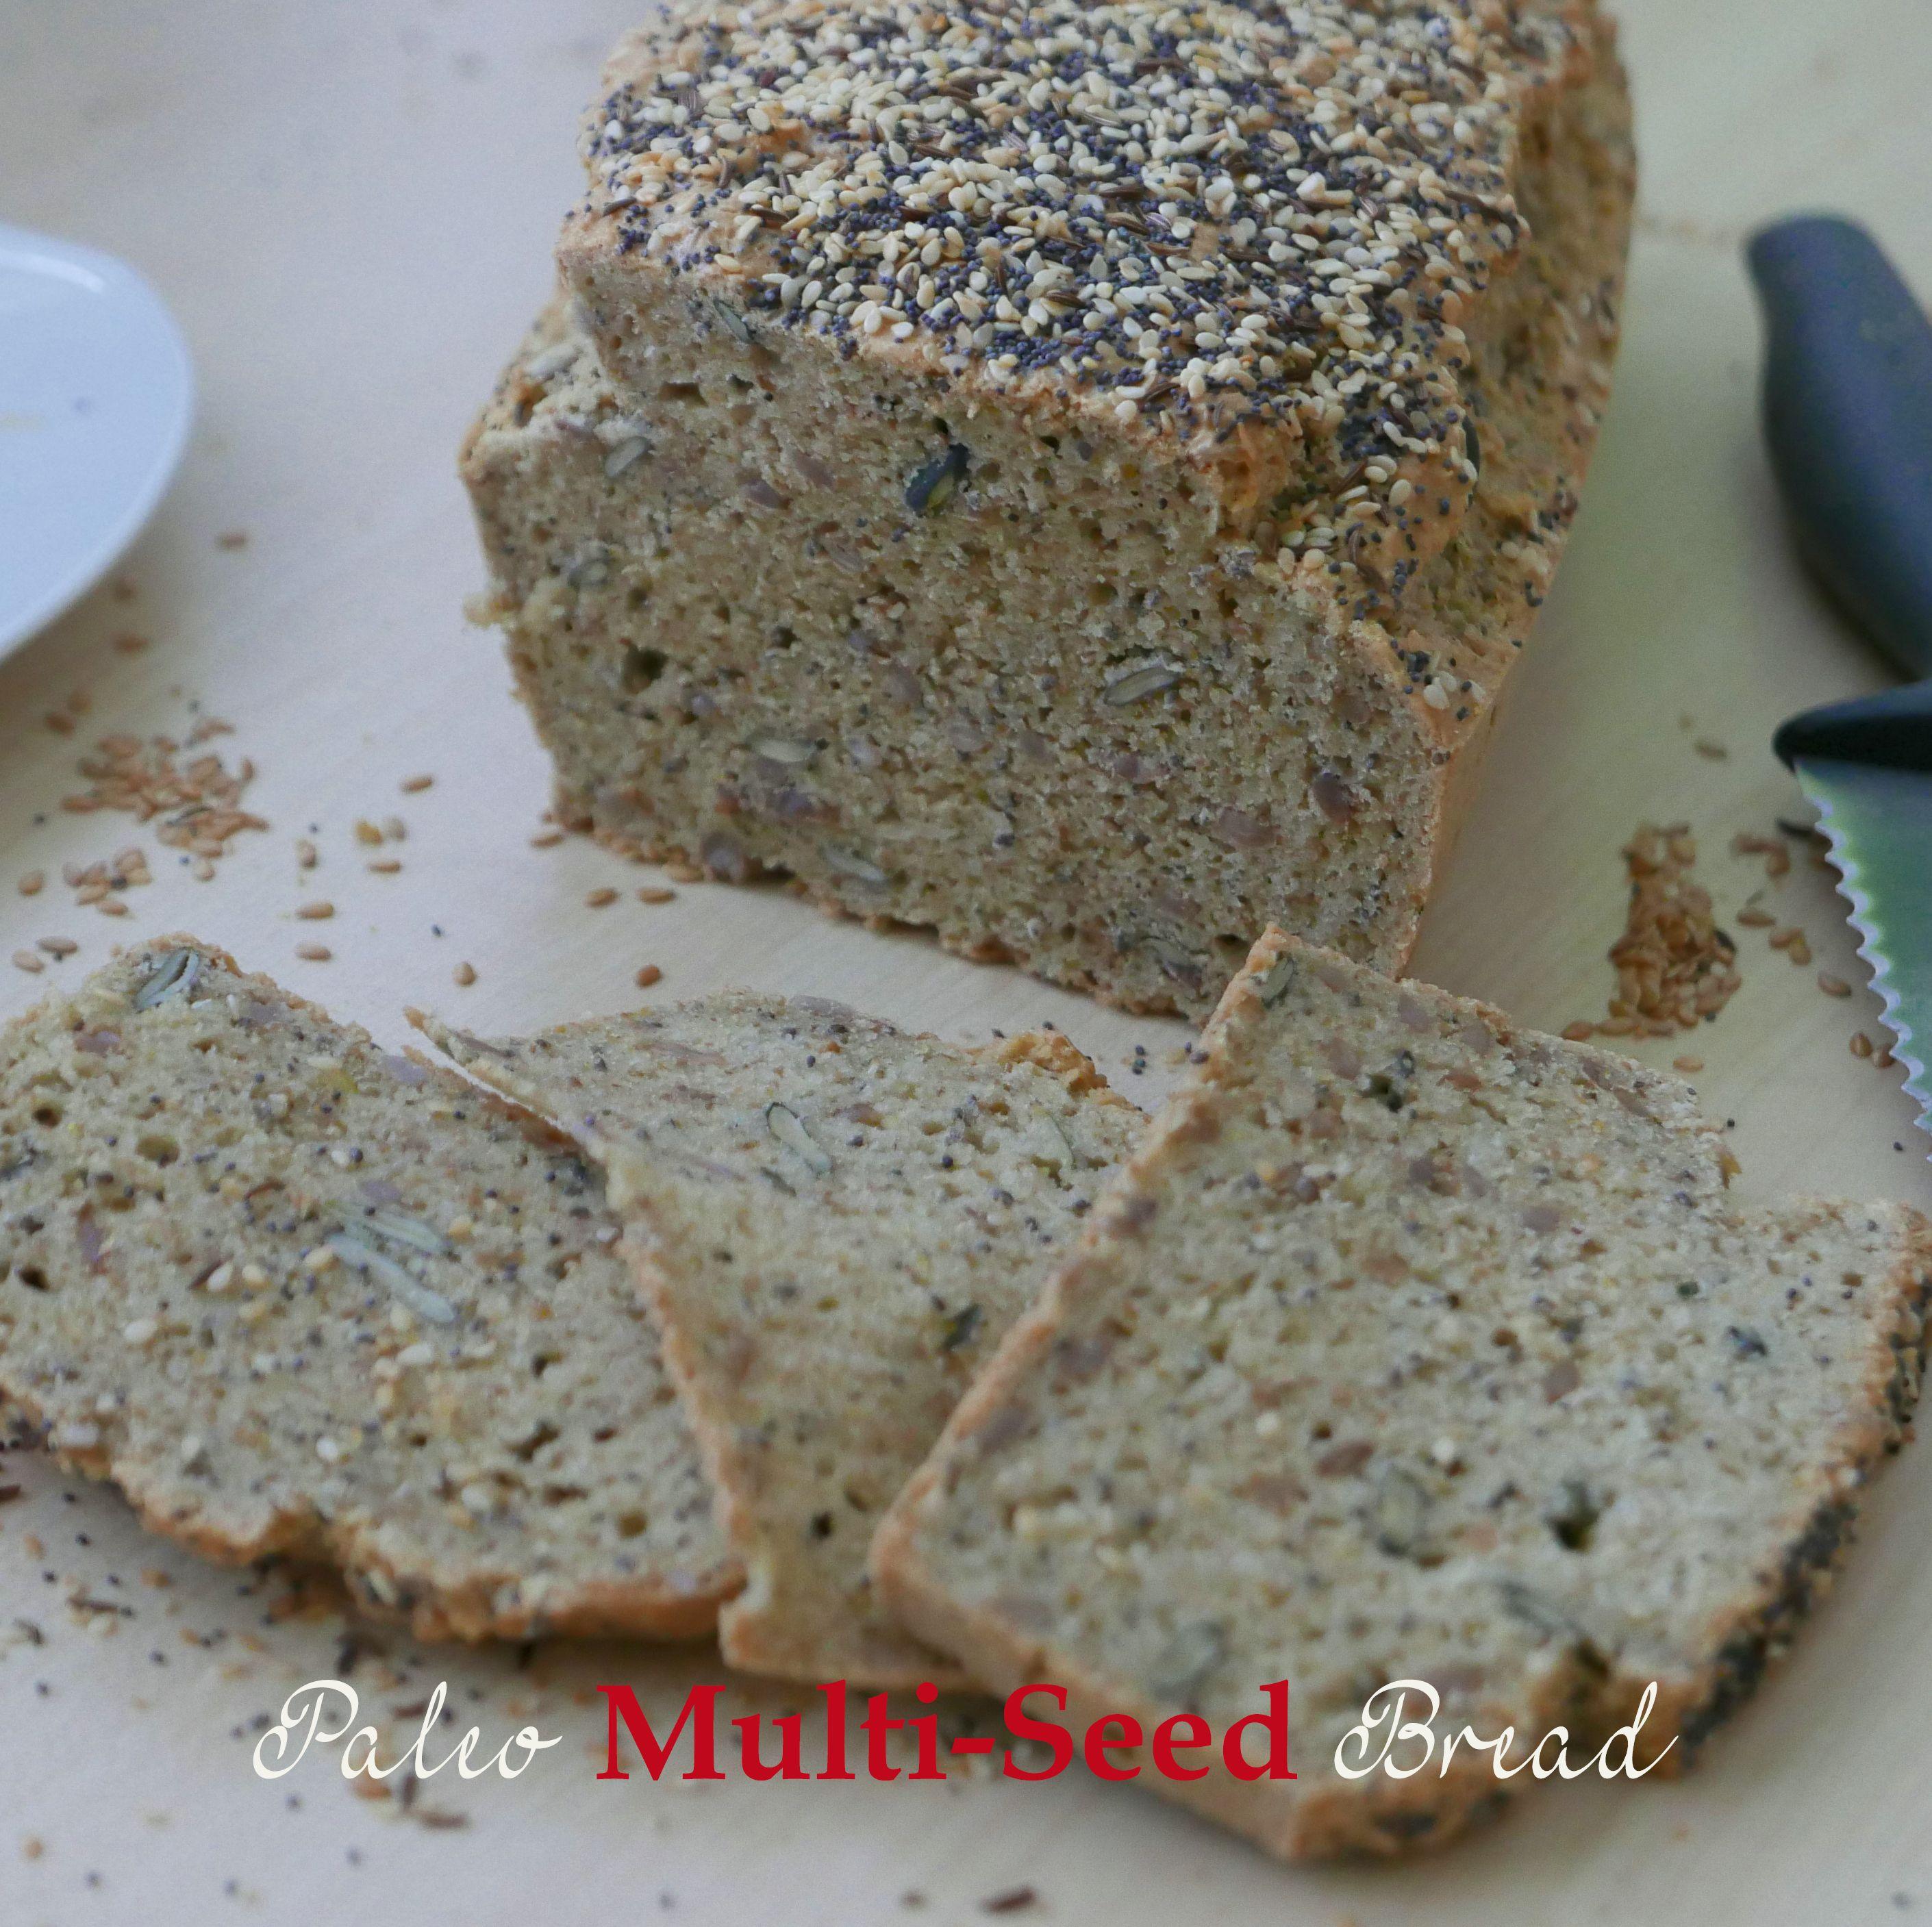 Paleo Multi-Seed Bread | Paleo, Keto, Gluten-Free,